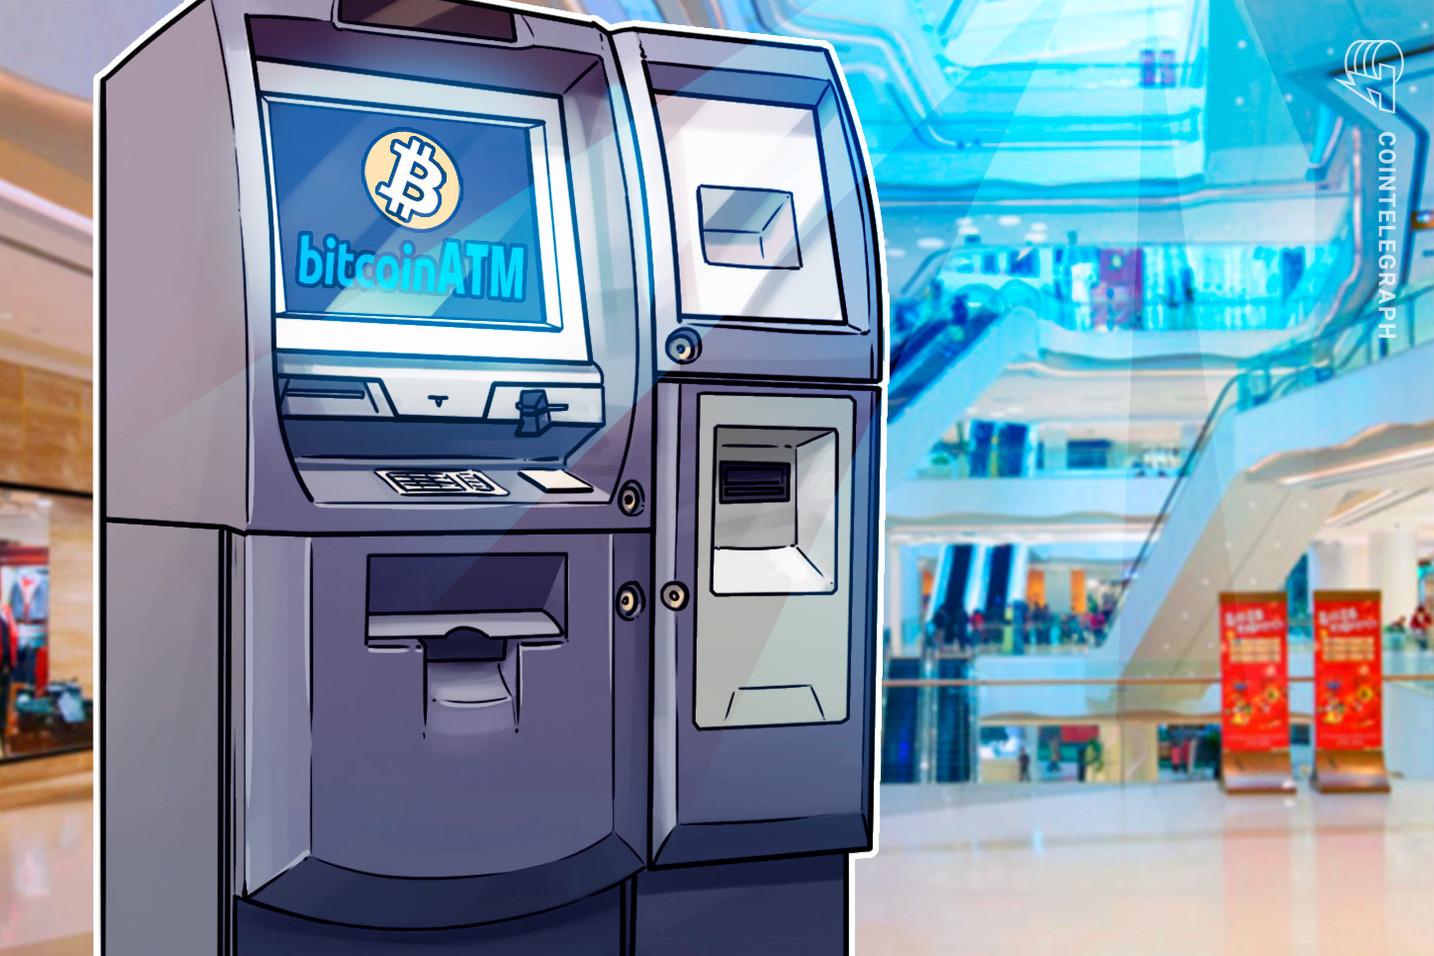 Größter amerikanischer Mall-Betreiber stellt Bitcoin-Geldautomaten auf